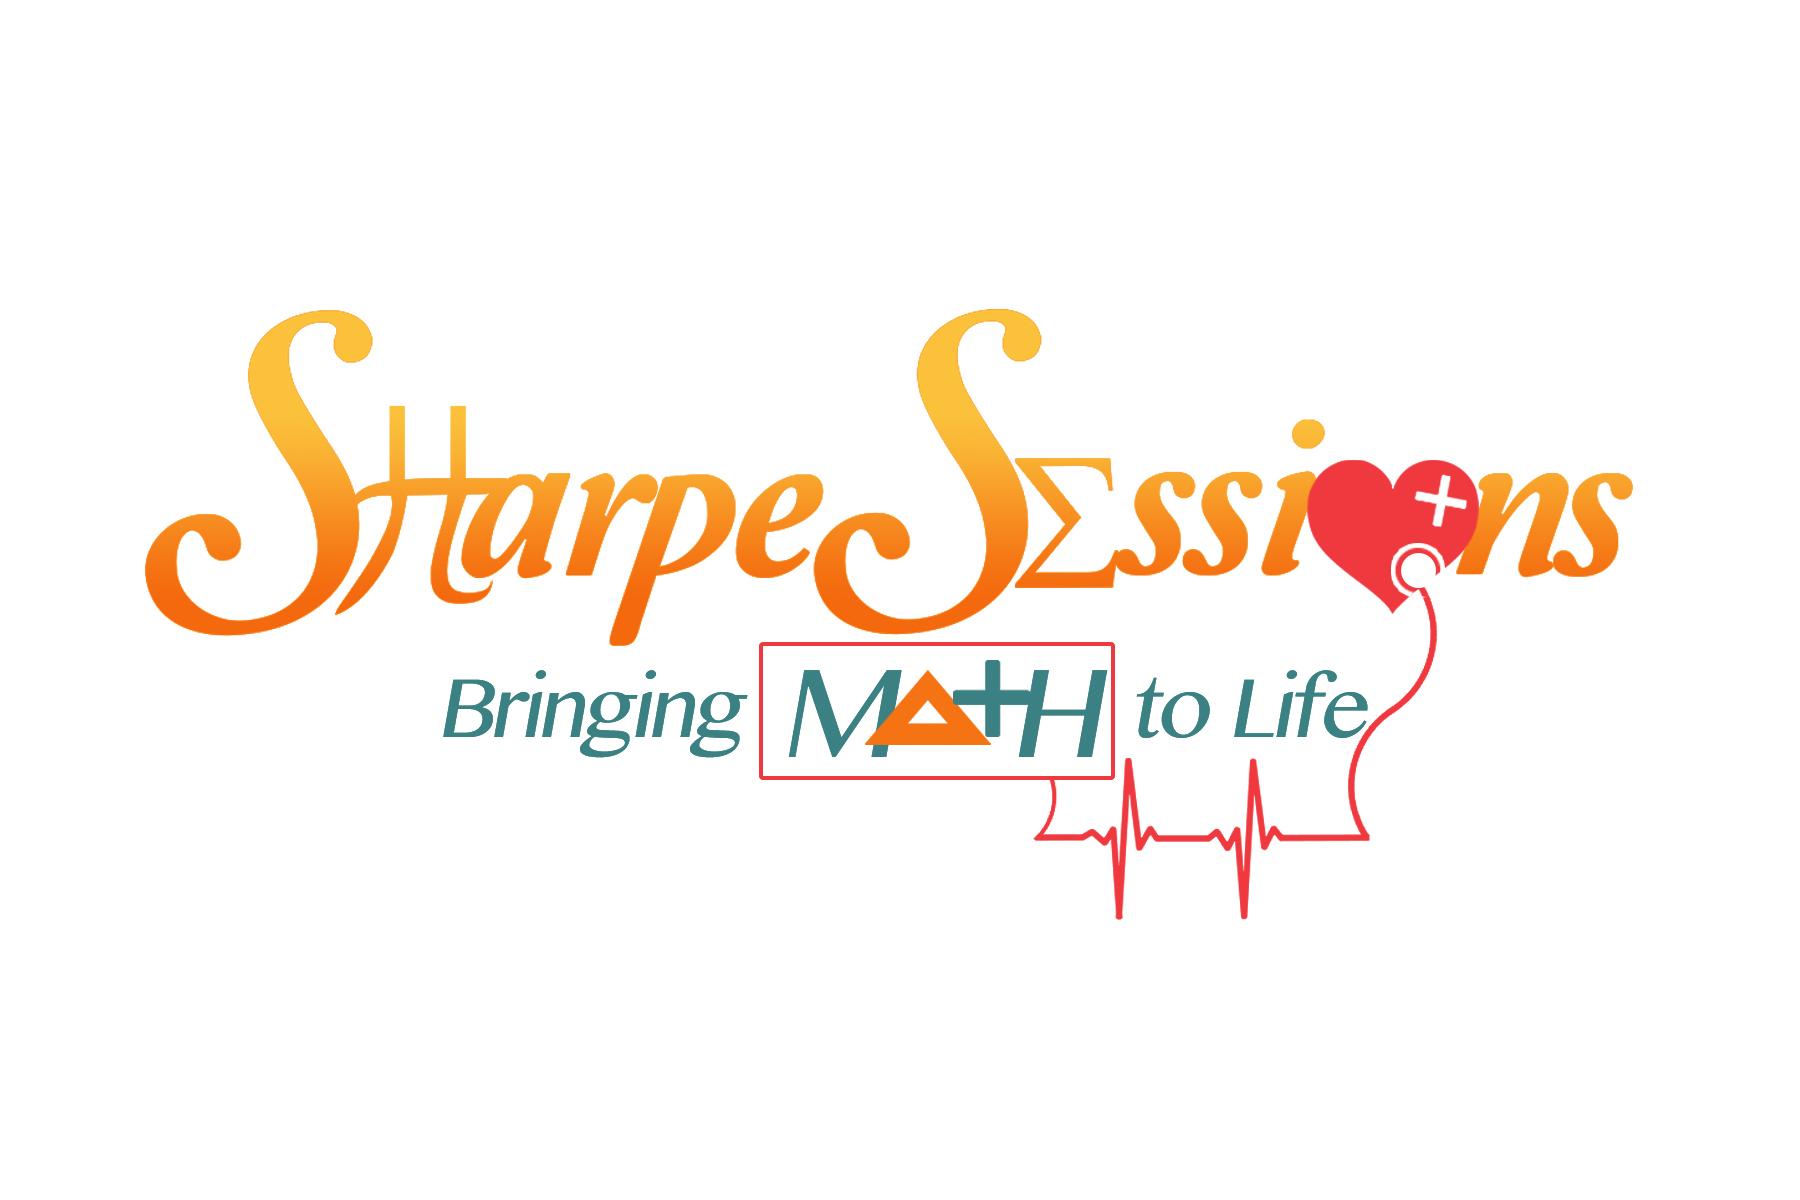 Sharpe Sessions